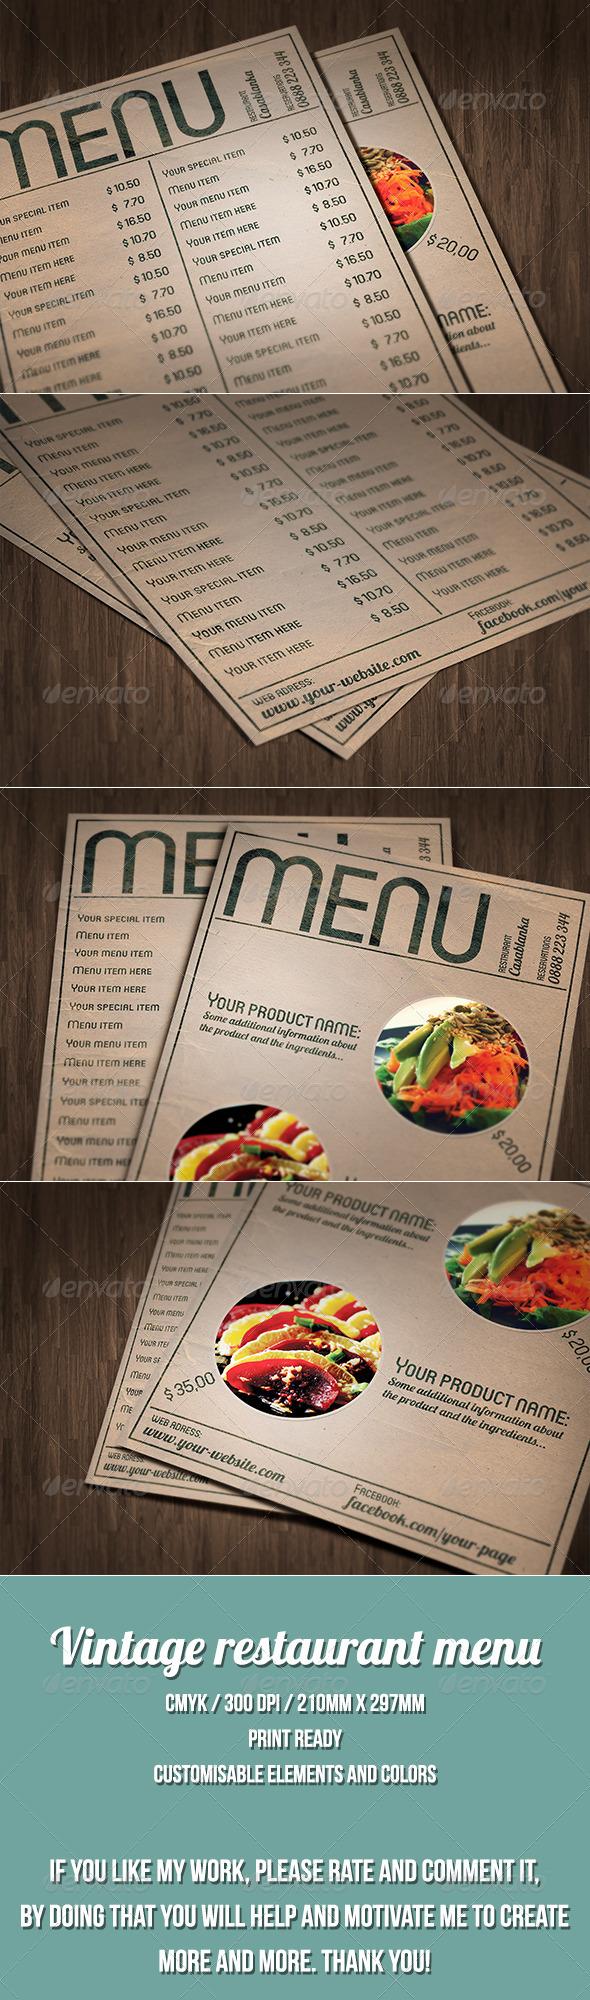 GraphicRiver Vintage style restaurant menu 7568420